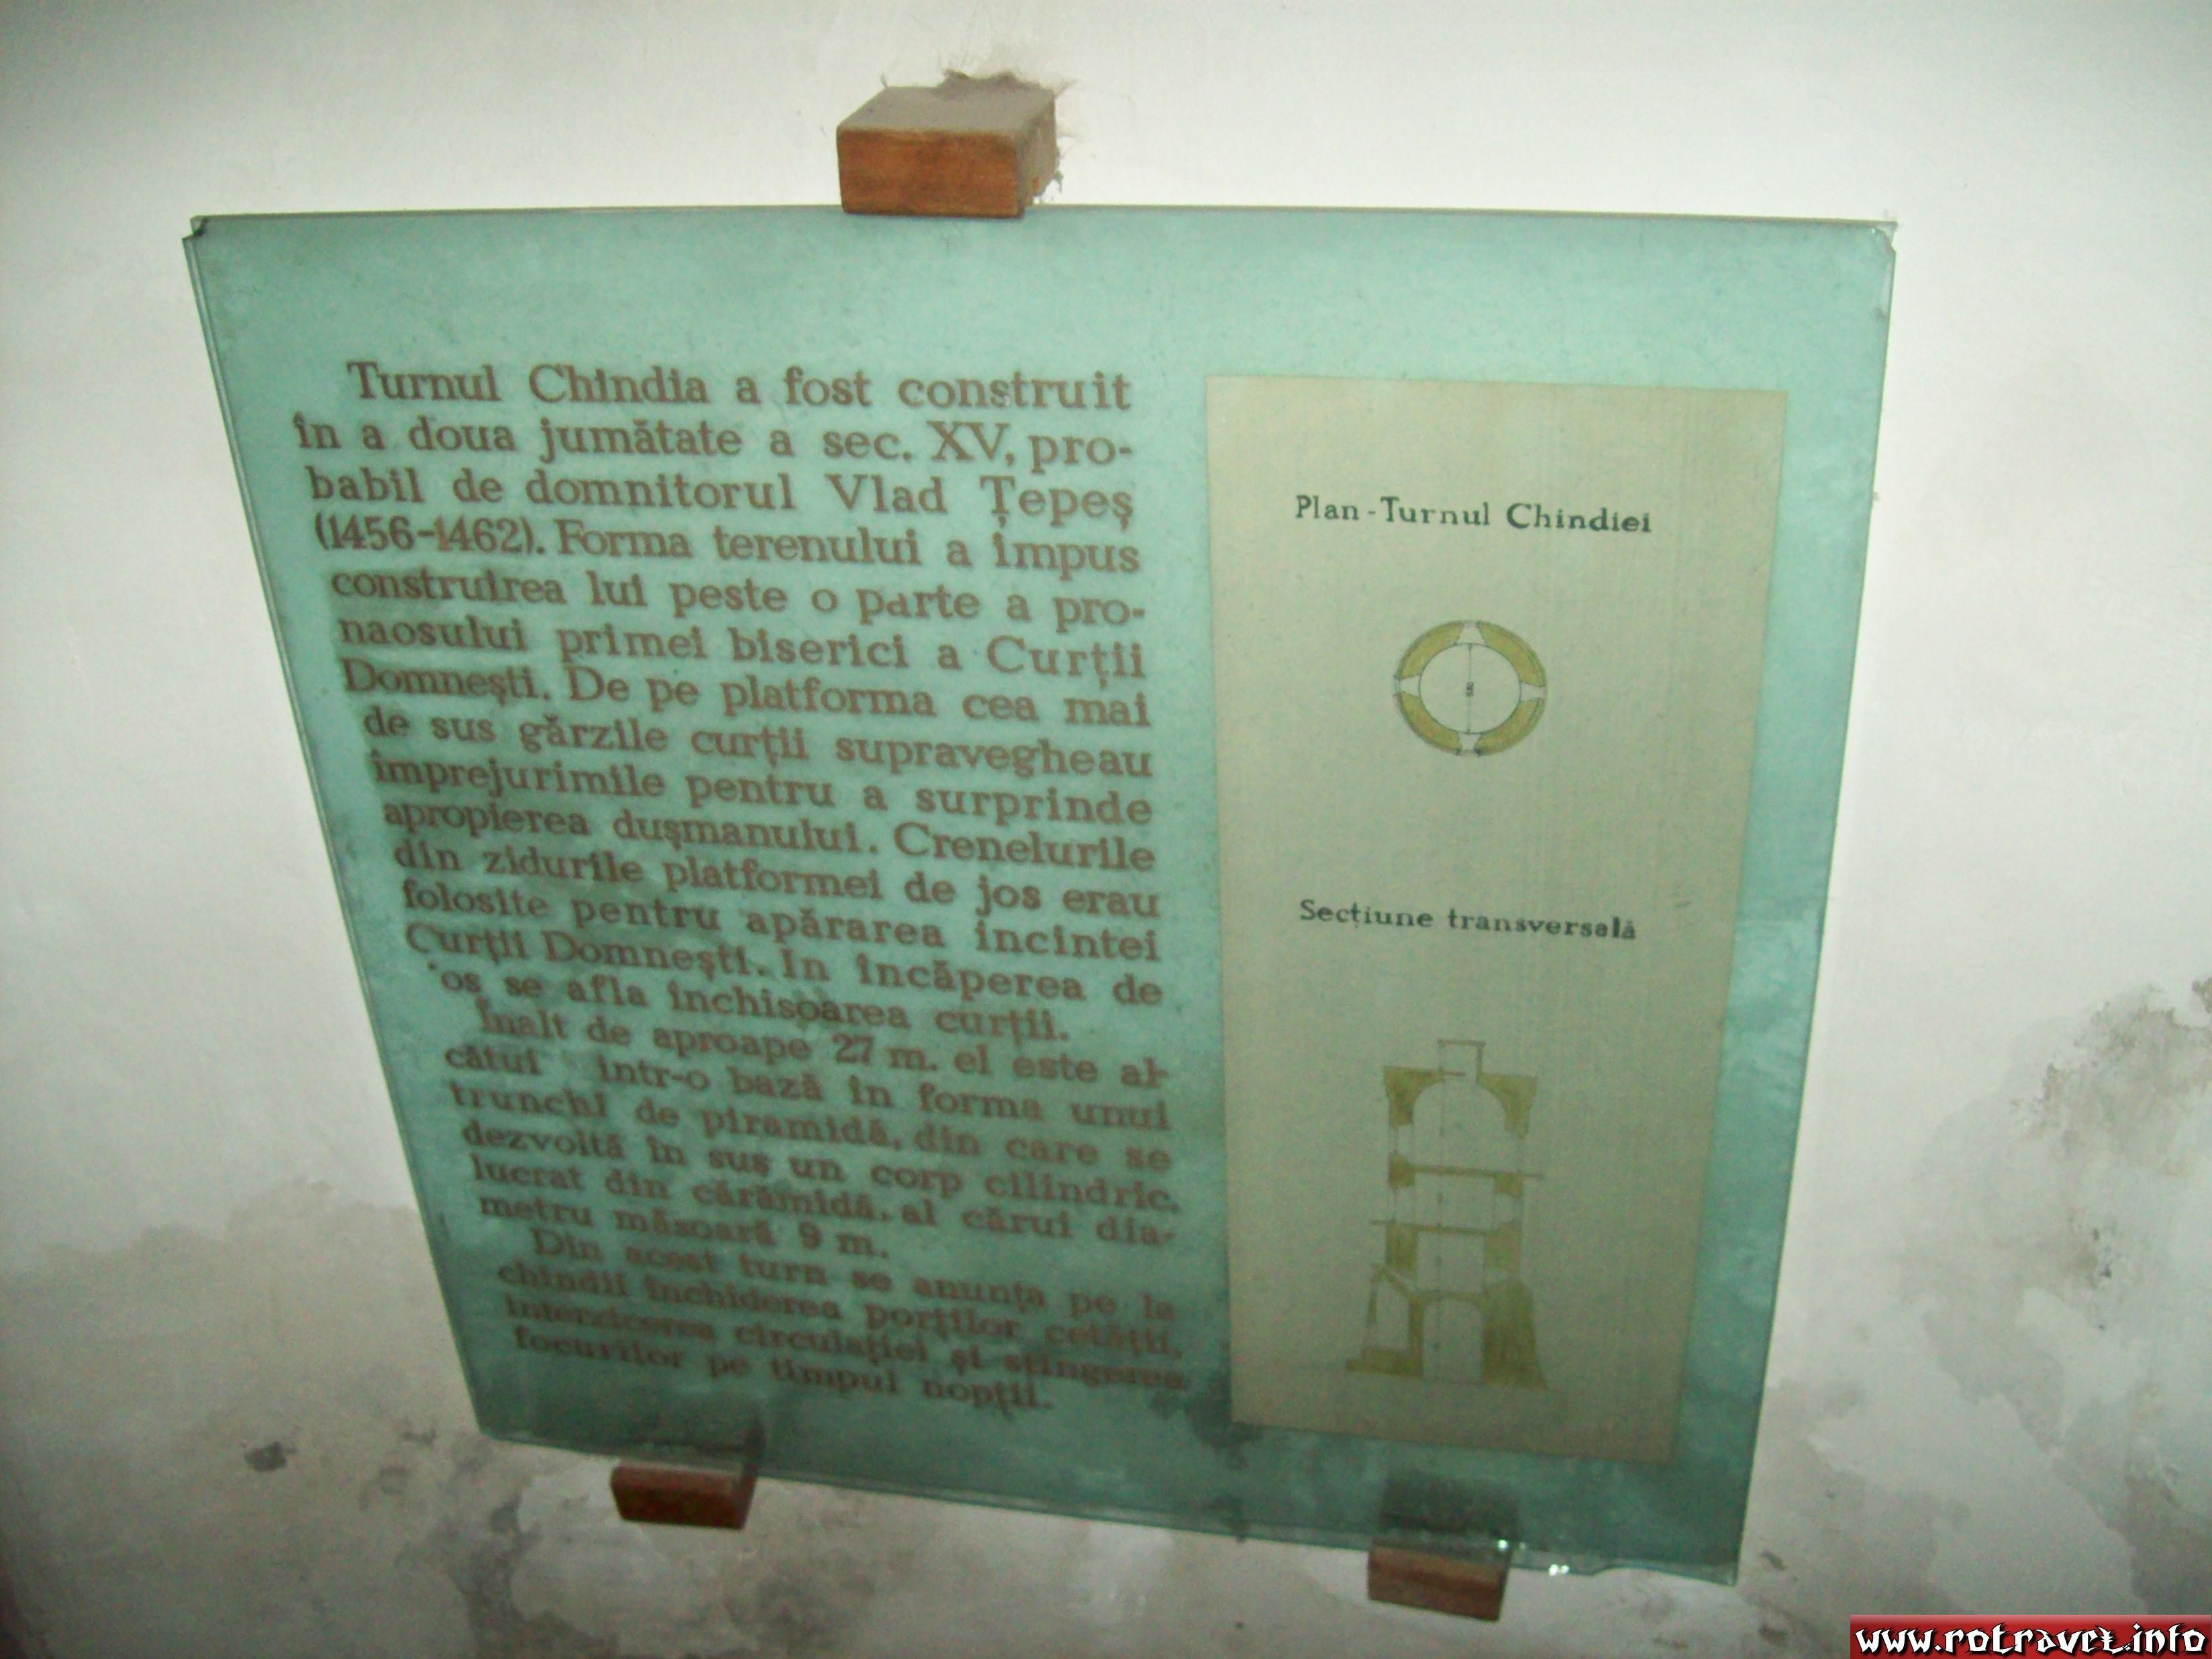 A short history of Chindia Tower